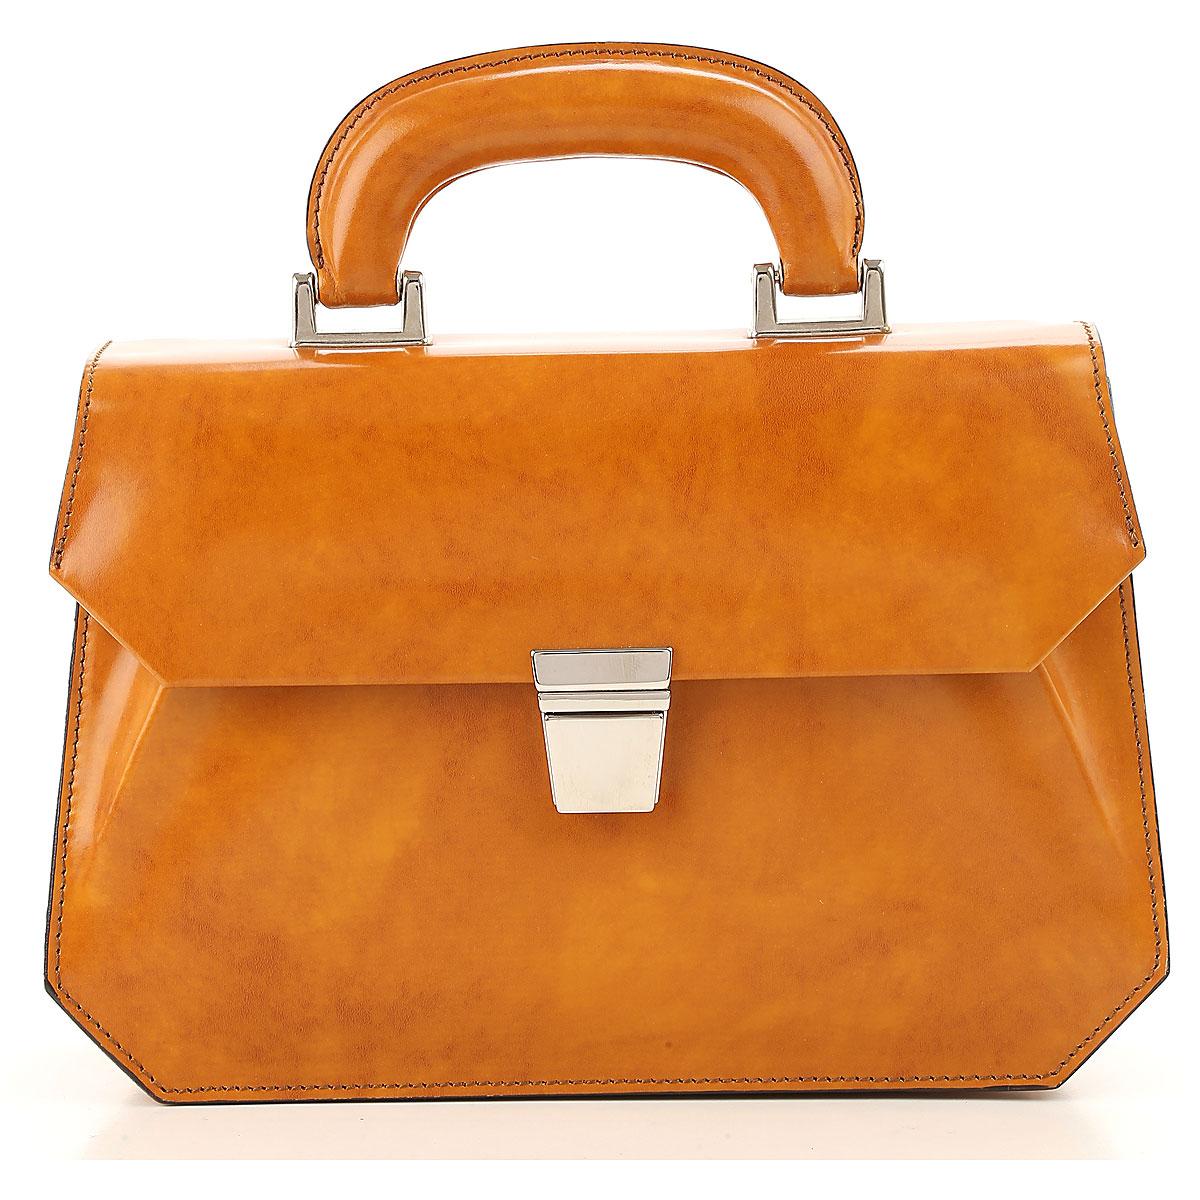 Image of Raffaello Top Handle Handbag On Sale in Outlet, Deep Orange, Leather, 2017